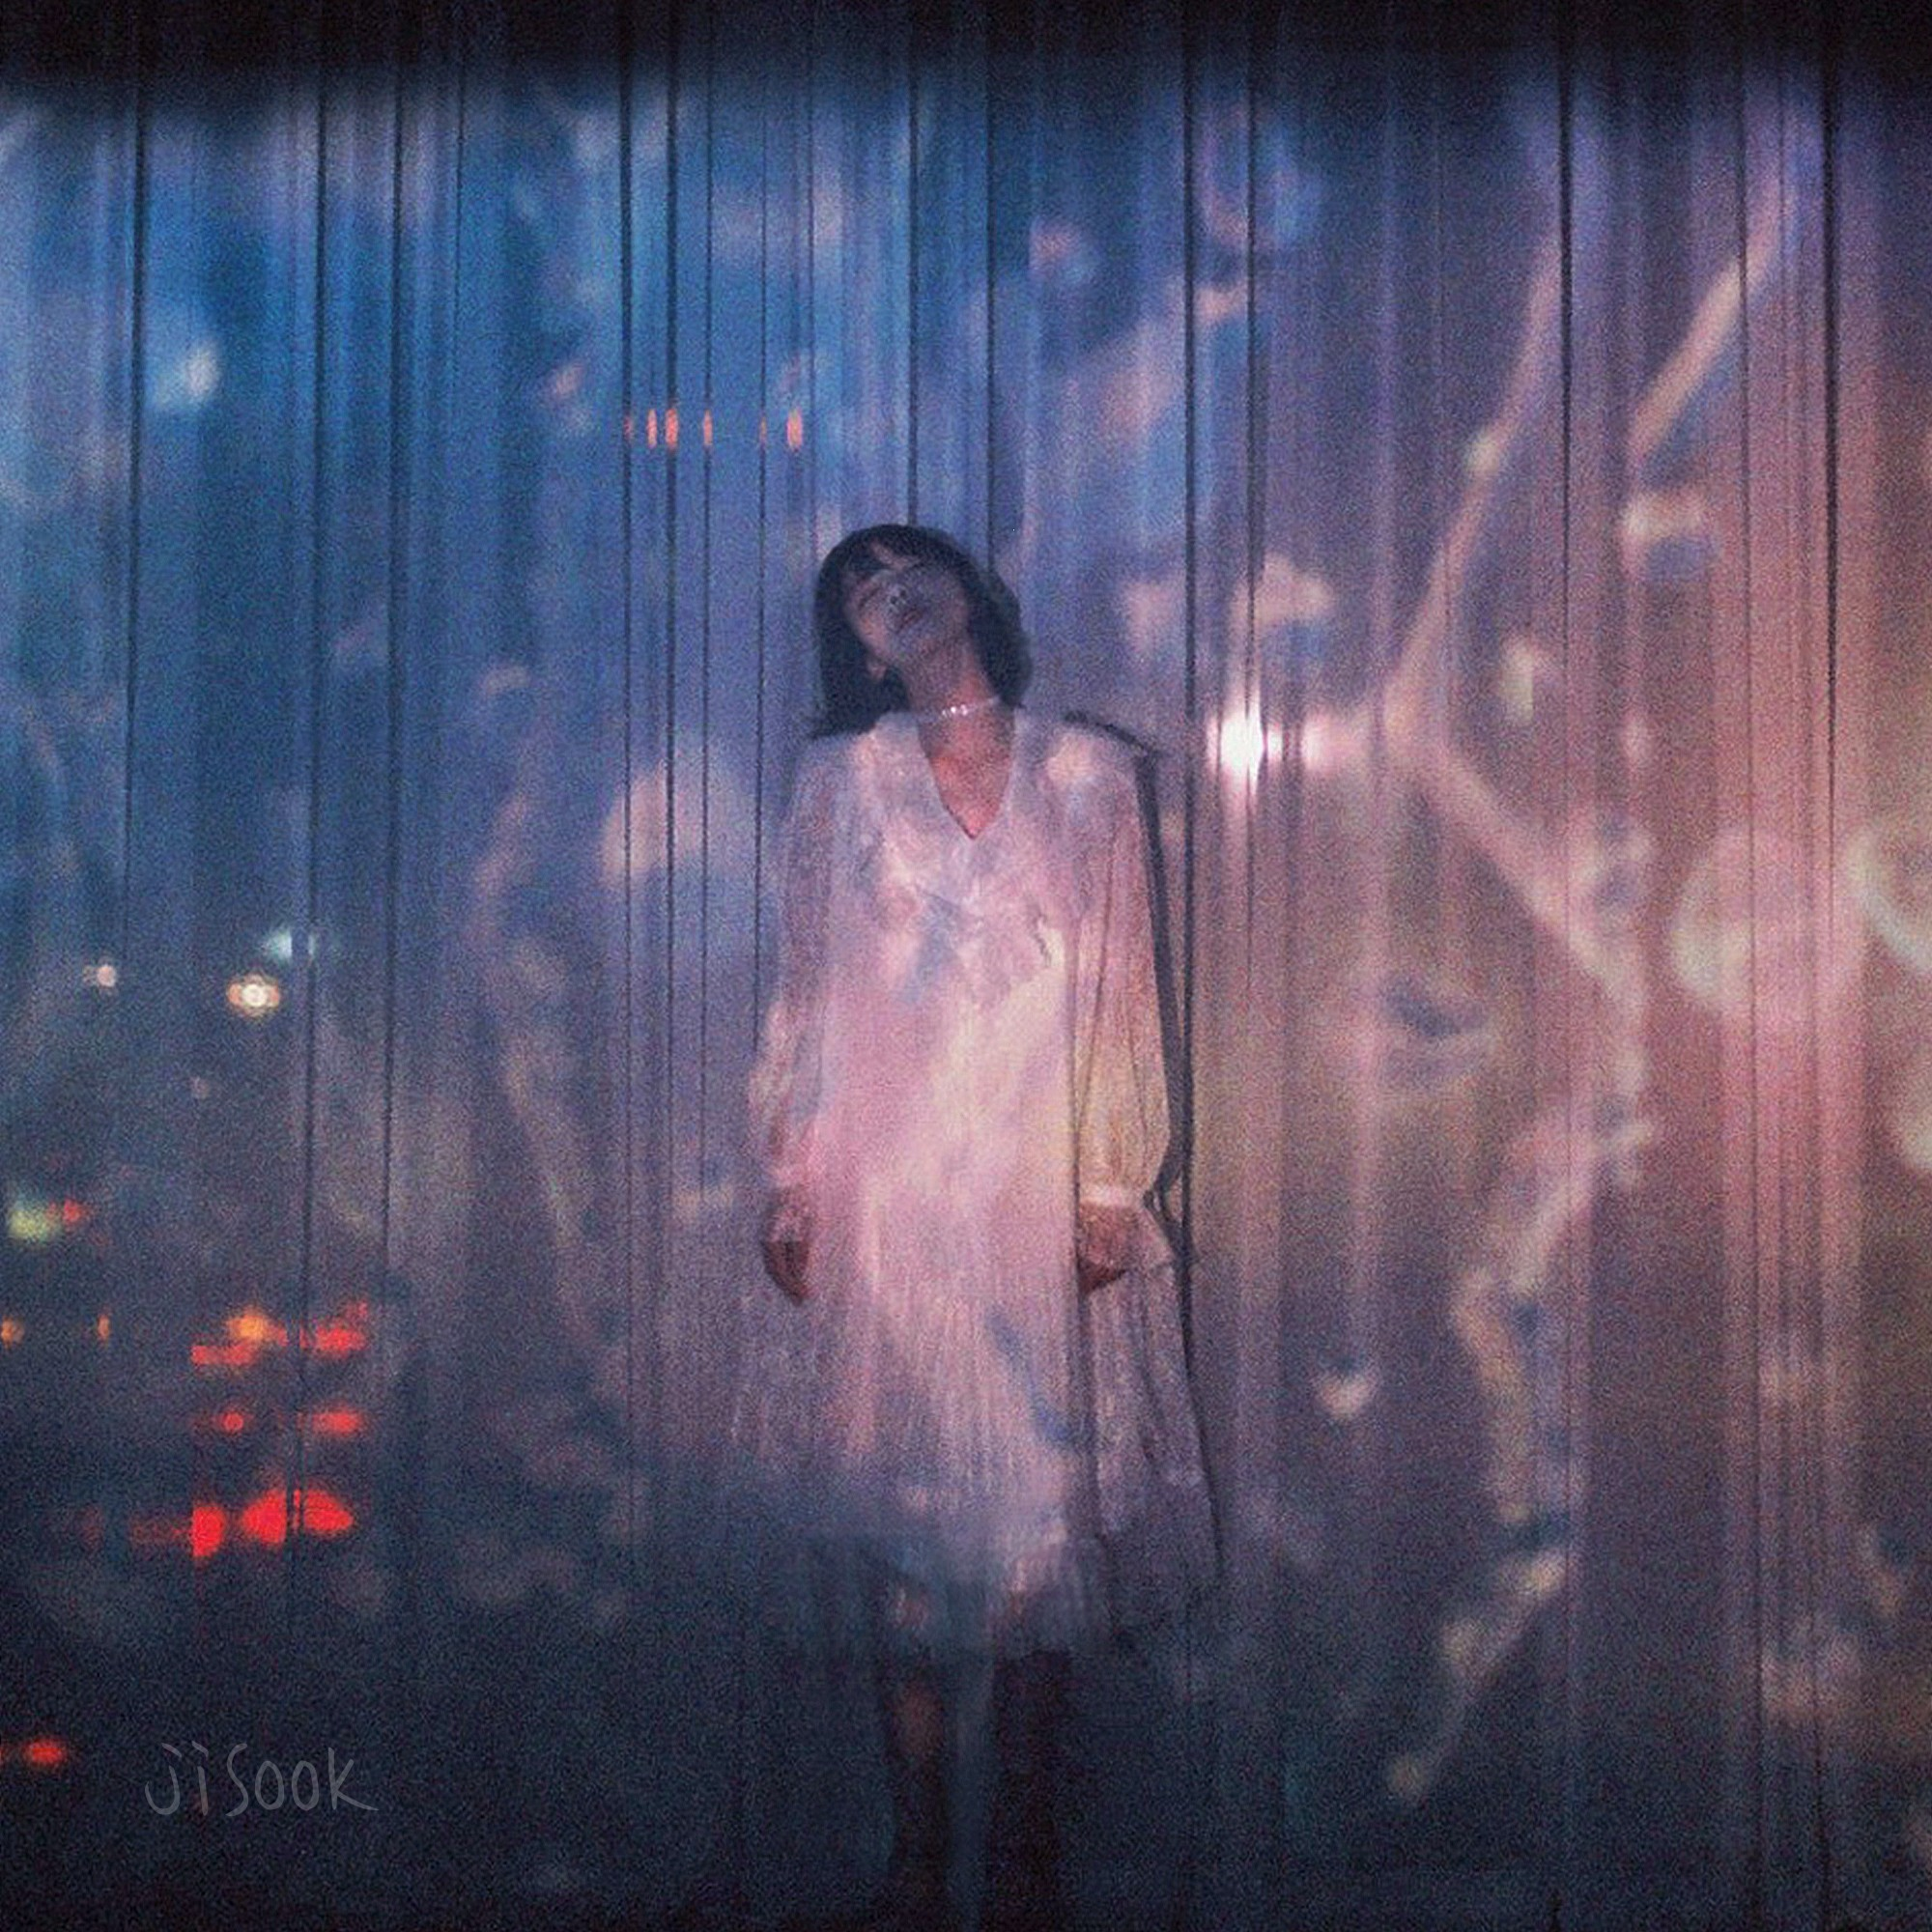 Kim Ji Sook (김지숙) – Umbrella (우산이 없어) [24bit Lossless + MP3 320 / WEB]  [2018.05.22]